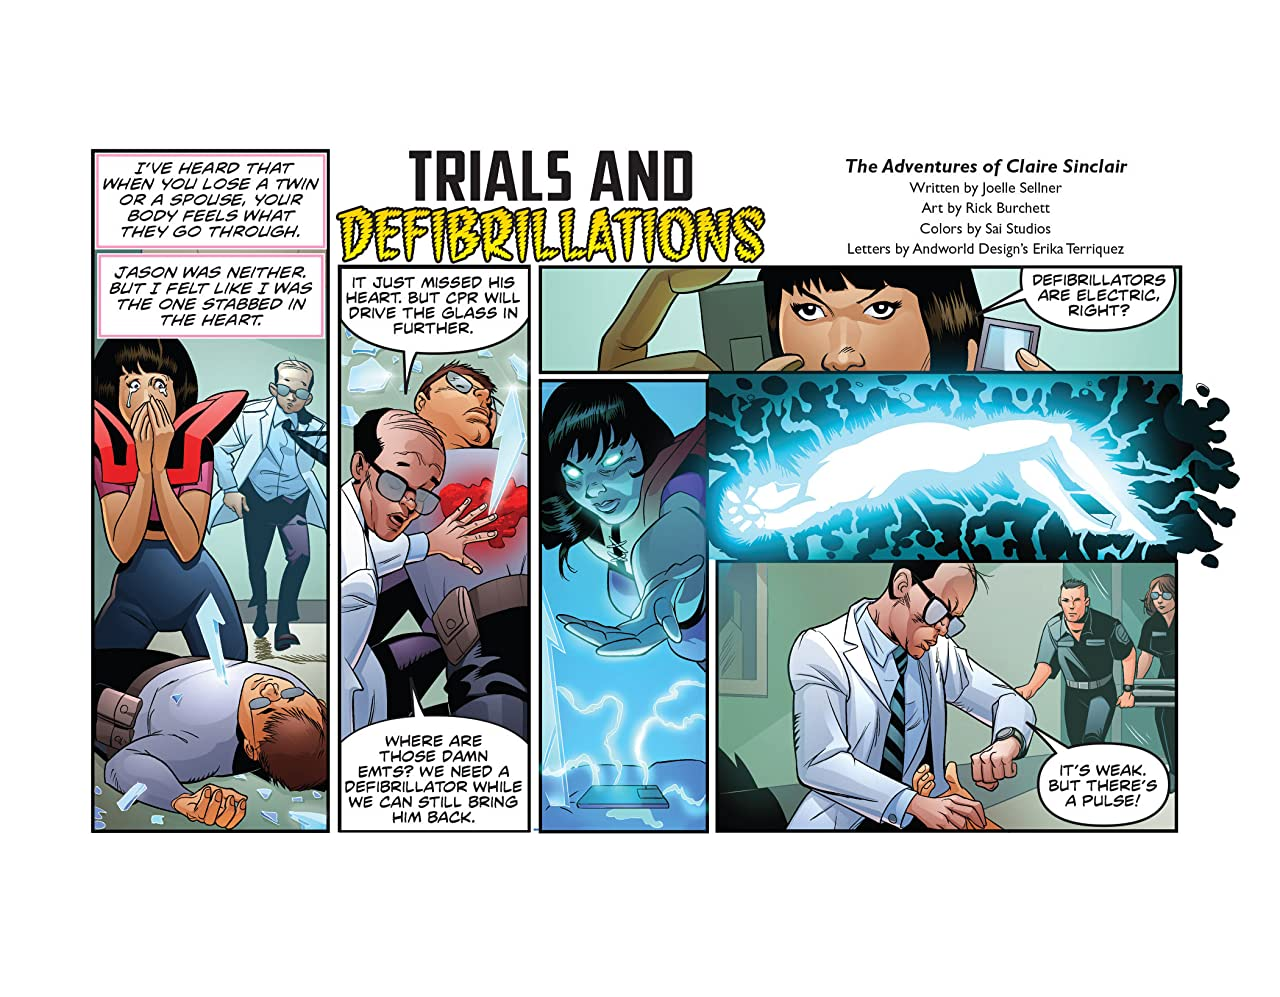 Wonderous: The Adventures of Claire Sinclair #7